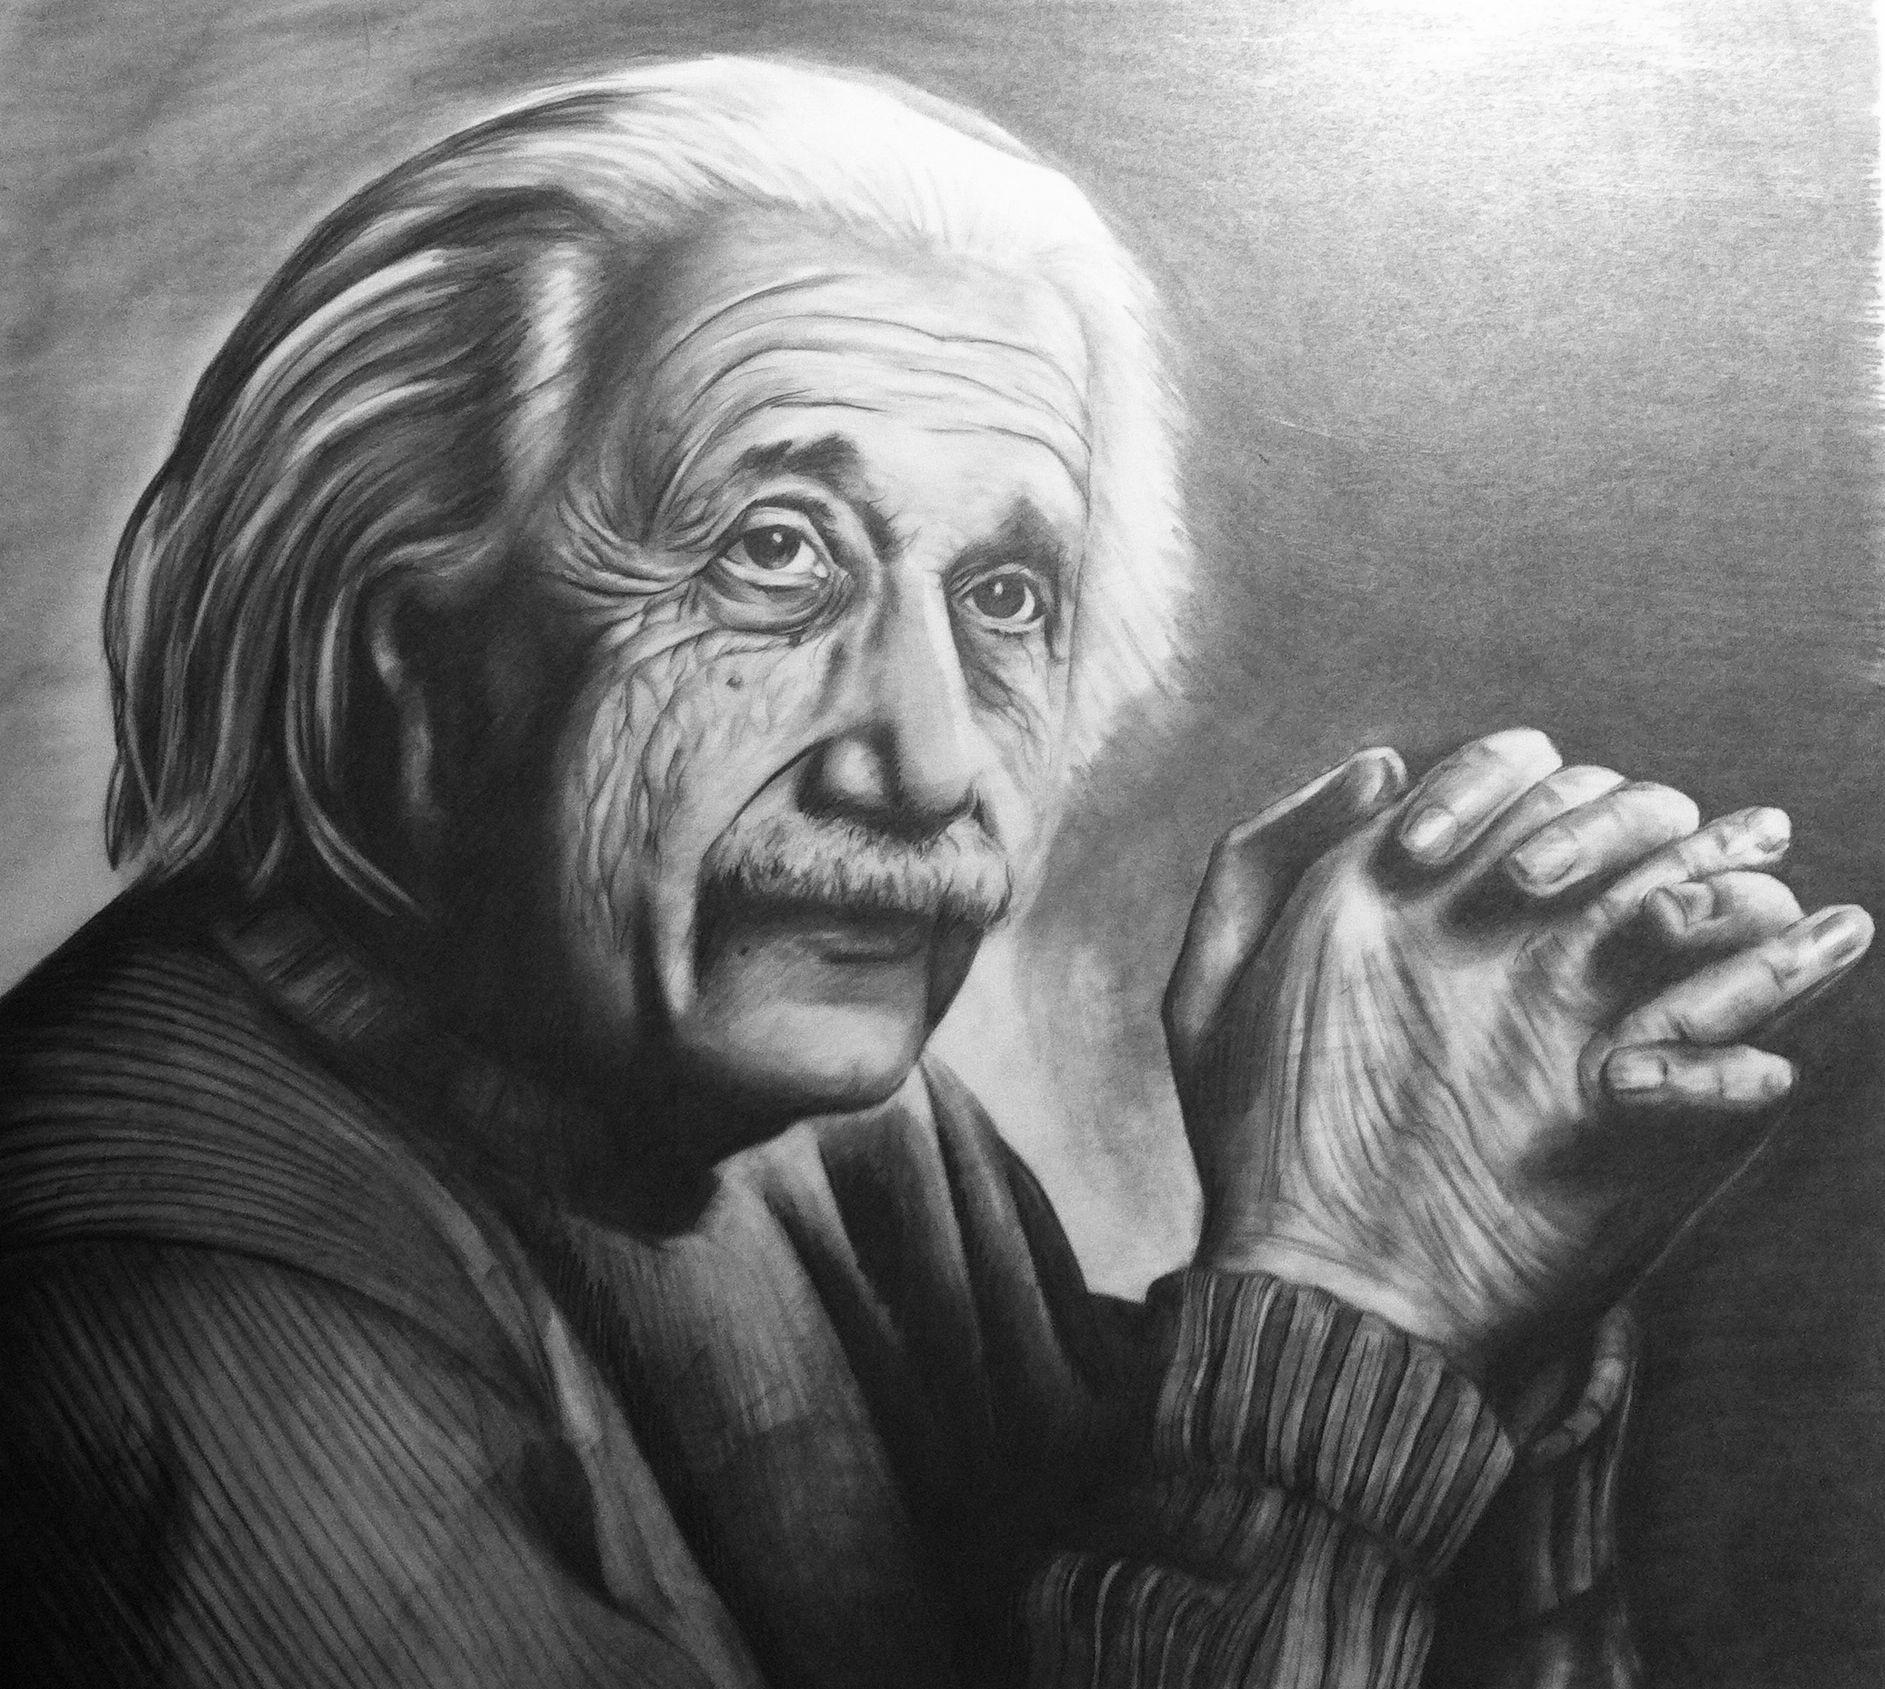 Drawn portrait made Drawn Pencil by Portraits